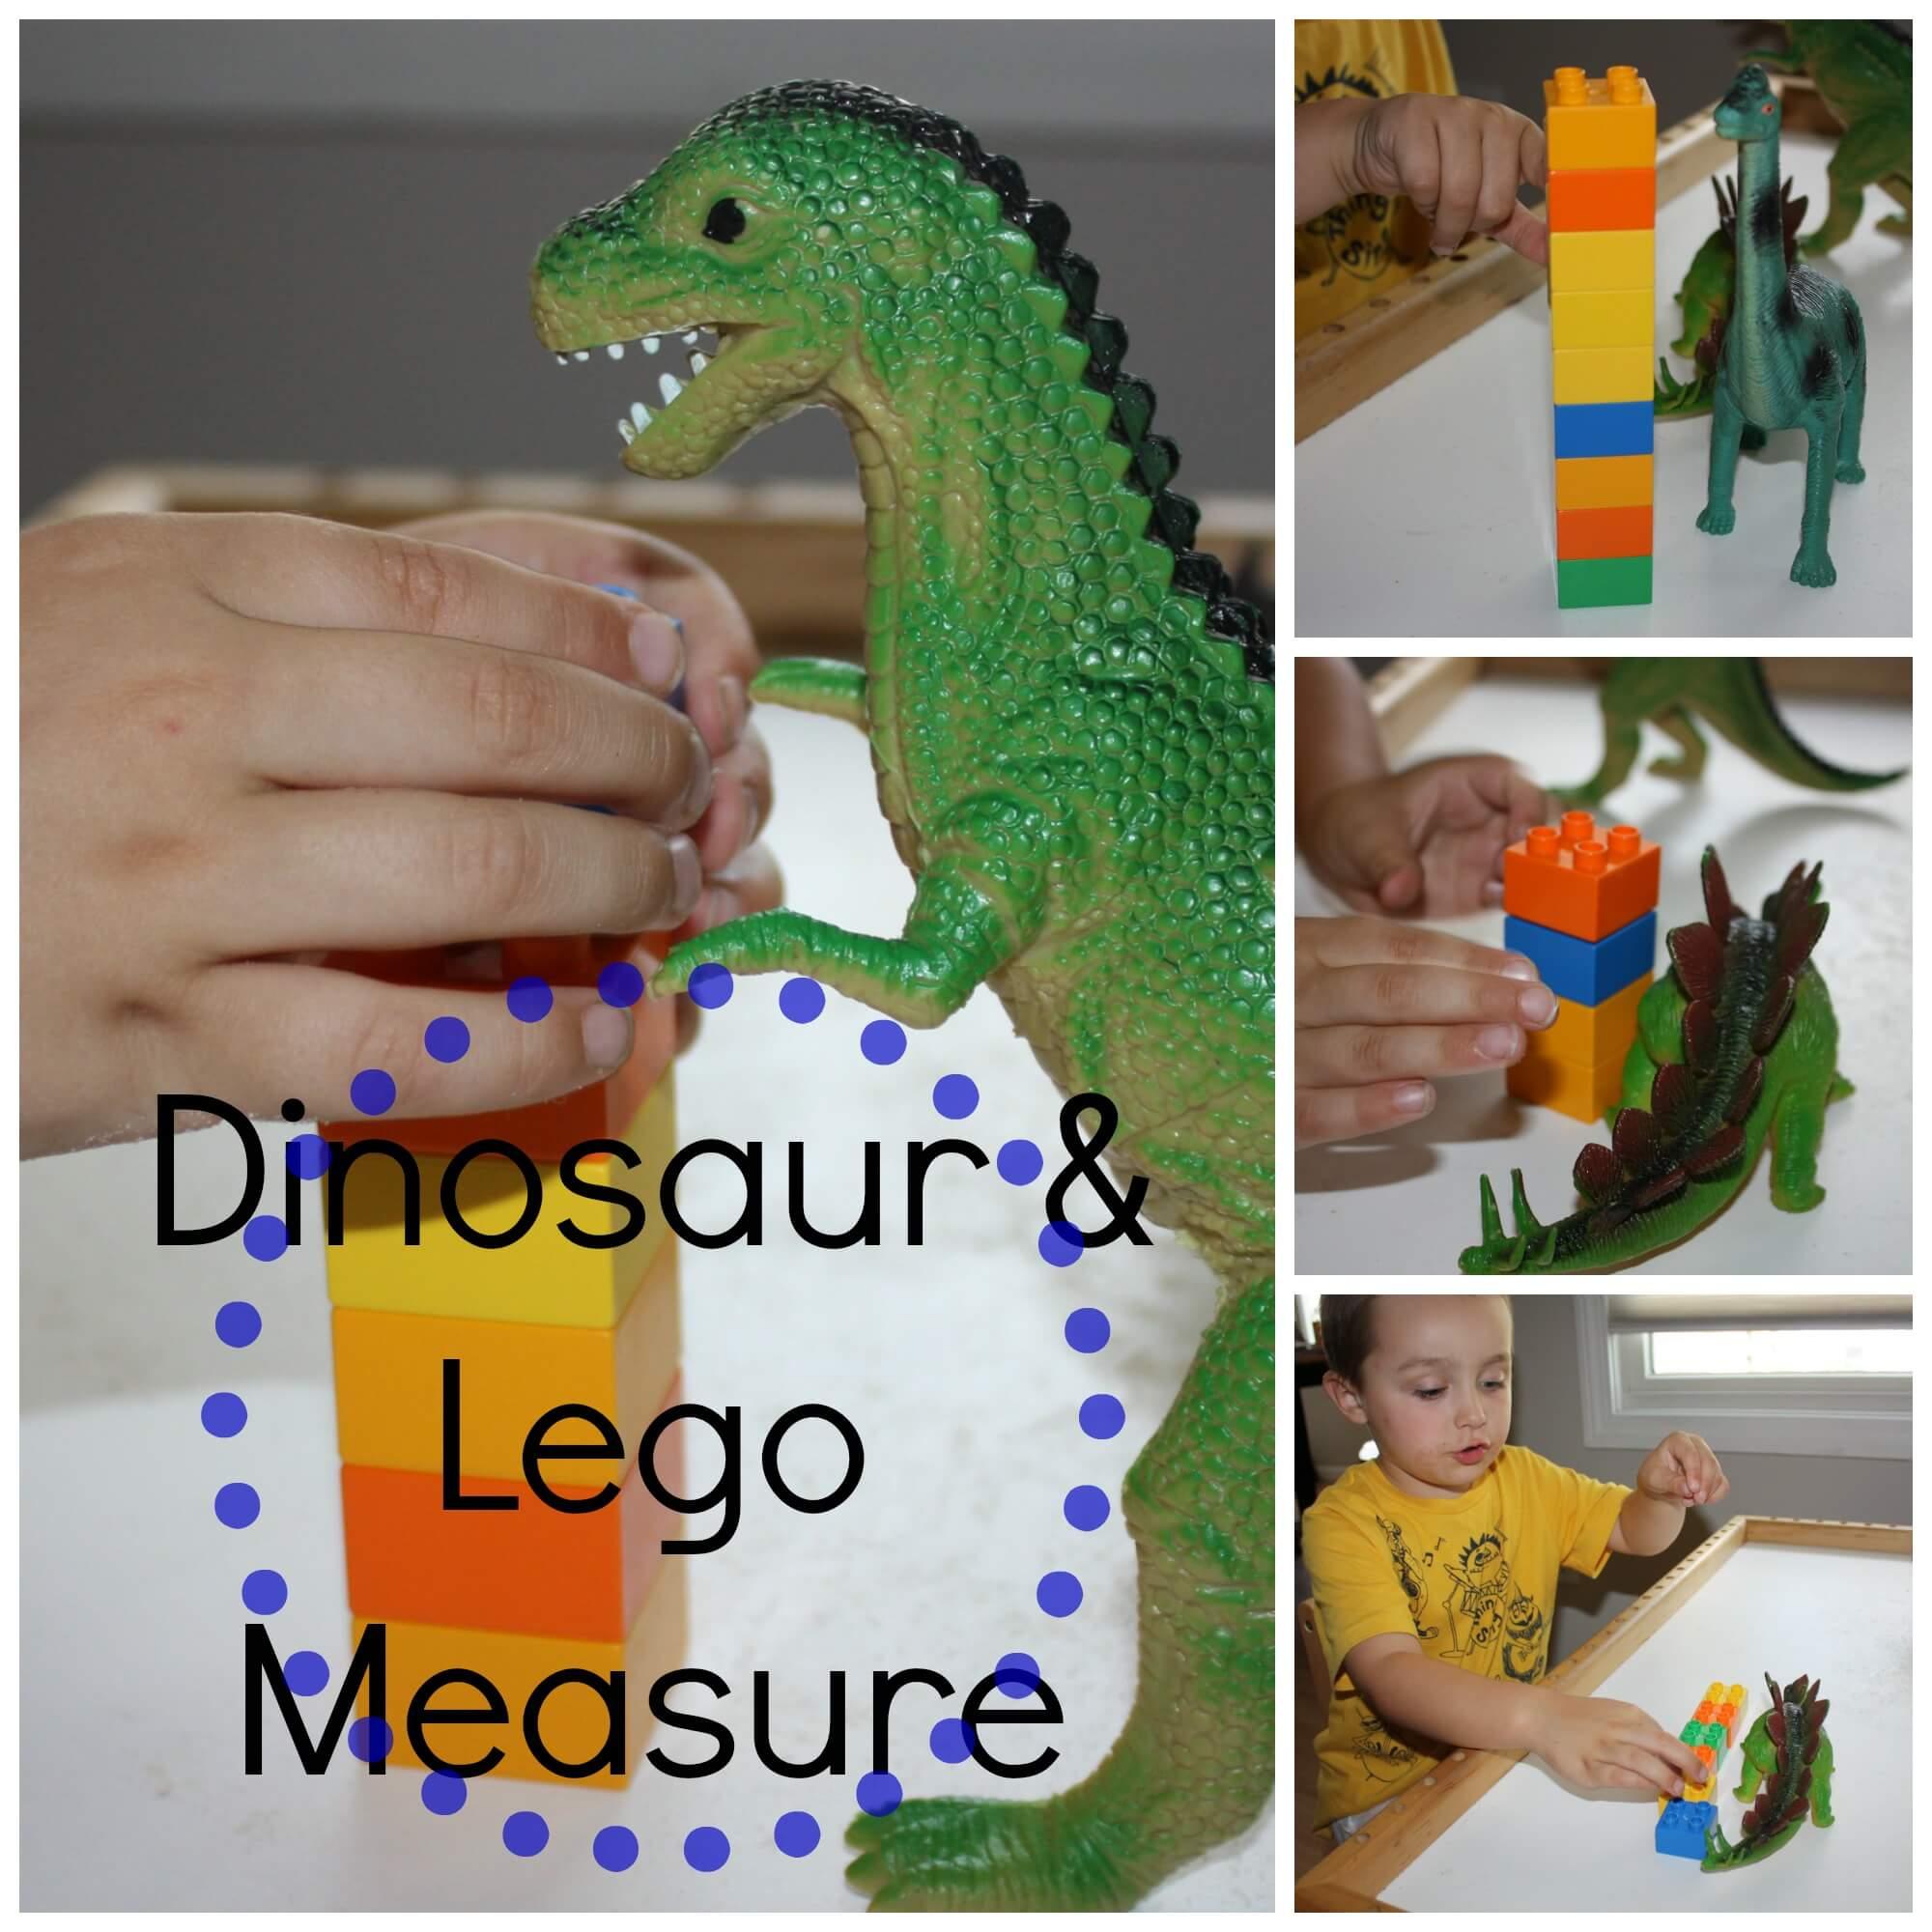 Measuring Activity For Preschoolers | Little Bins for ...